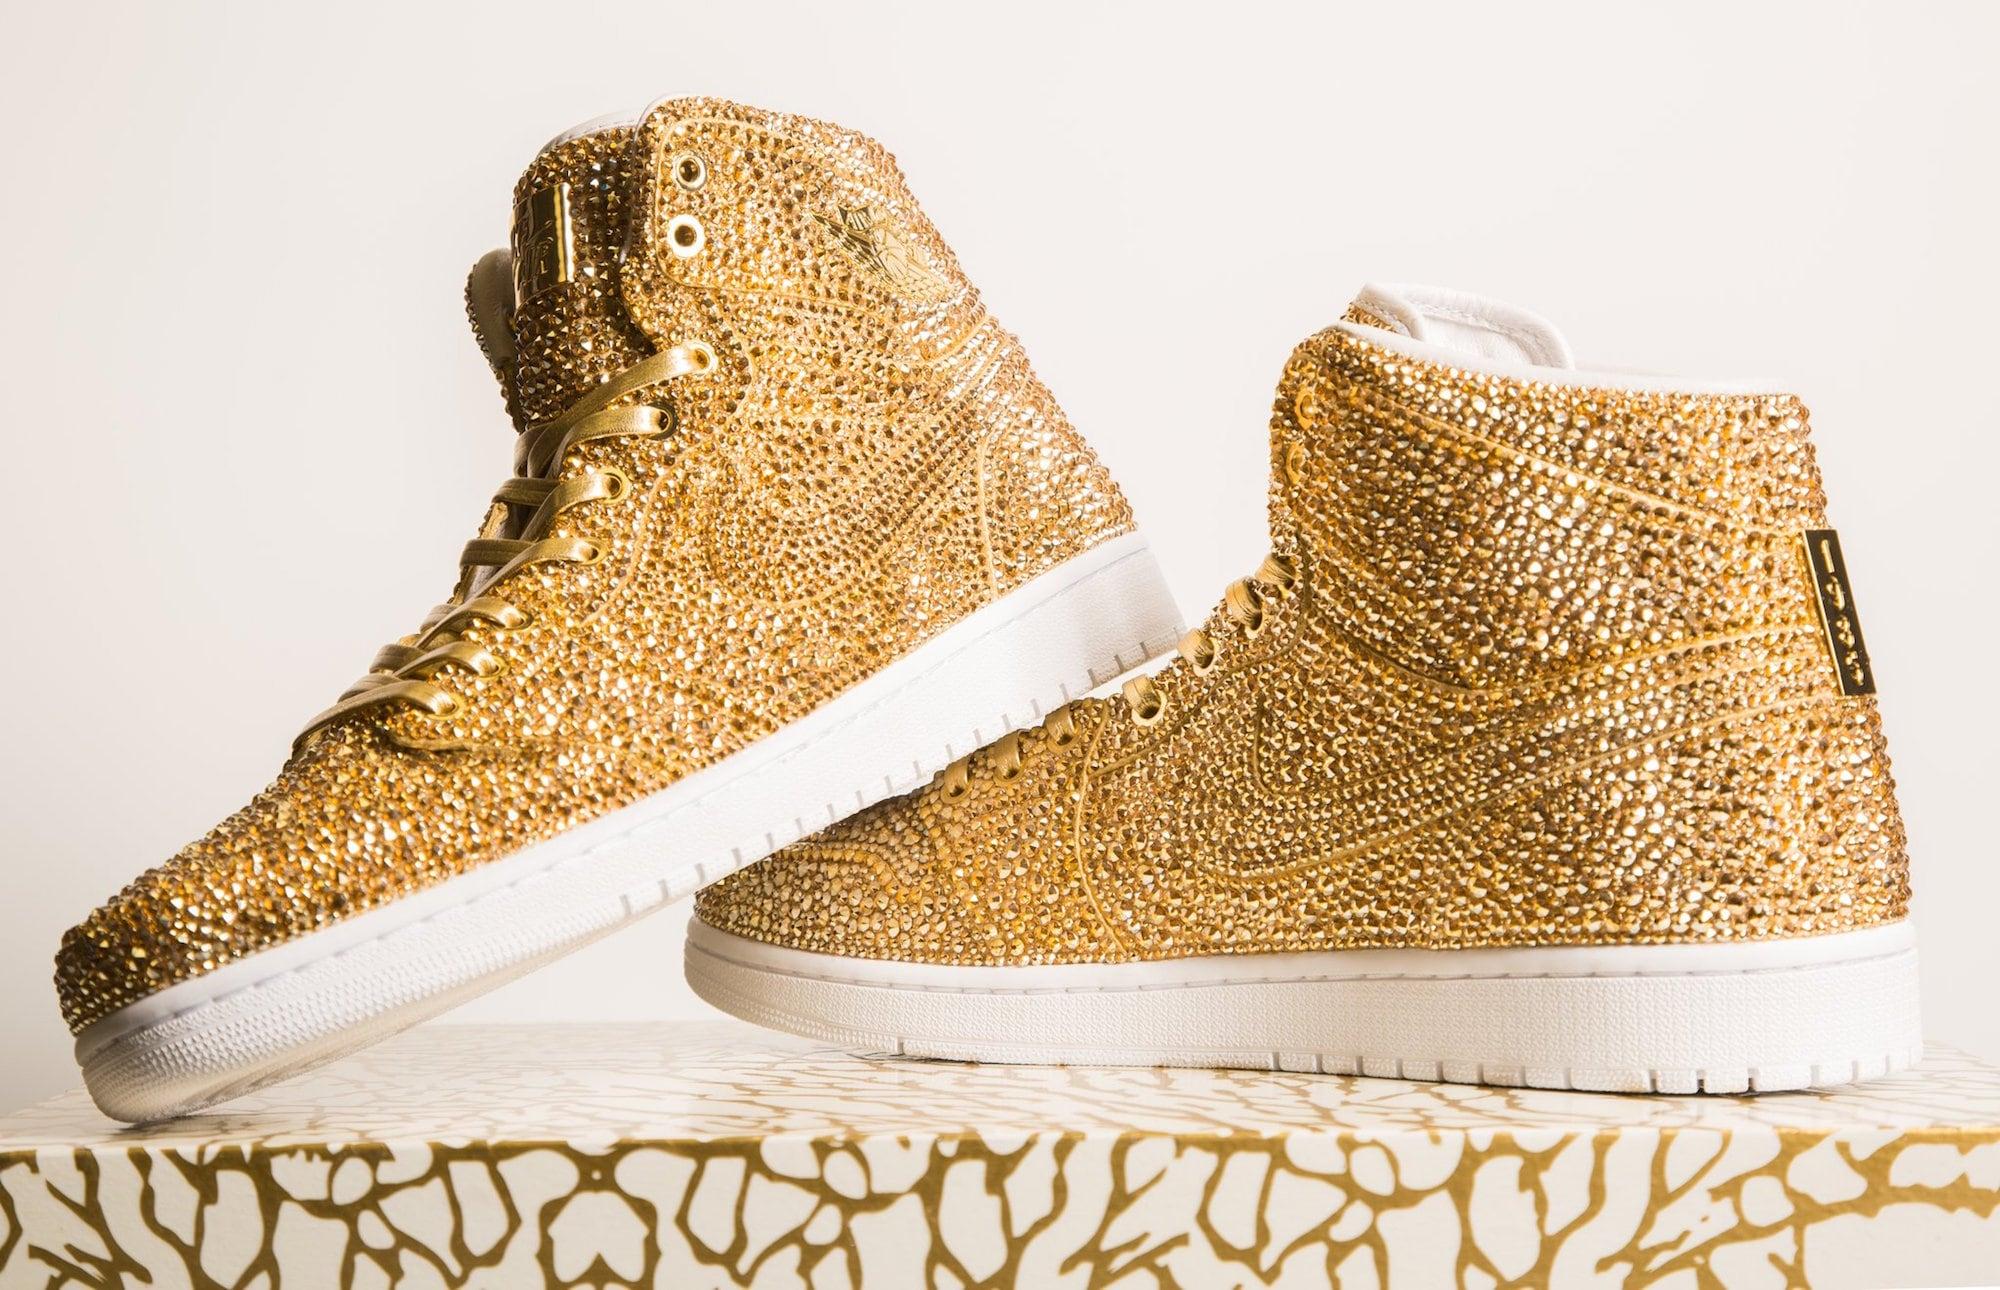 Daniel Jacob verziert Nike Air Jordans mit Swarovski Kristallen 1